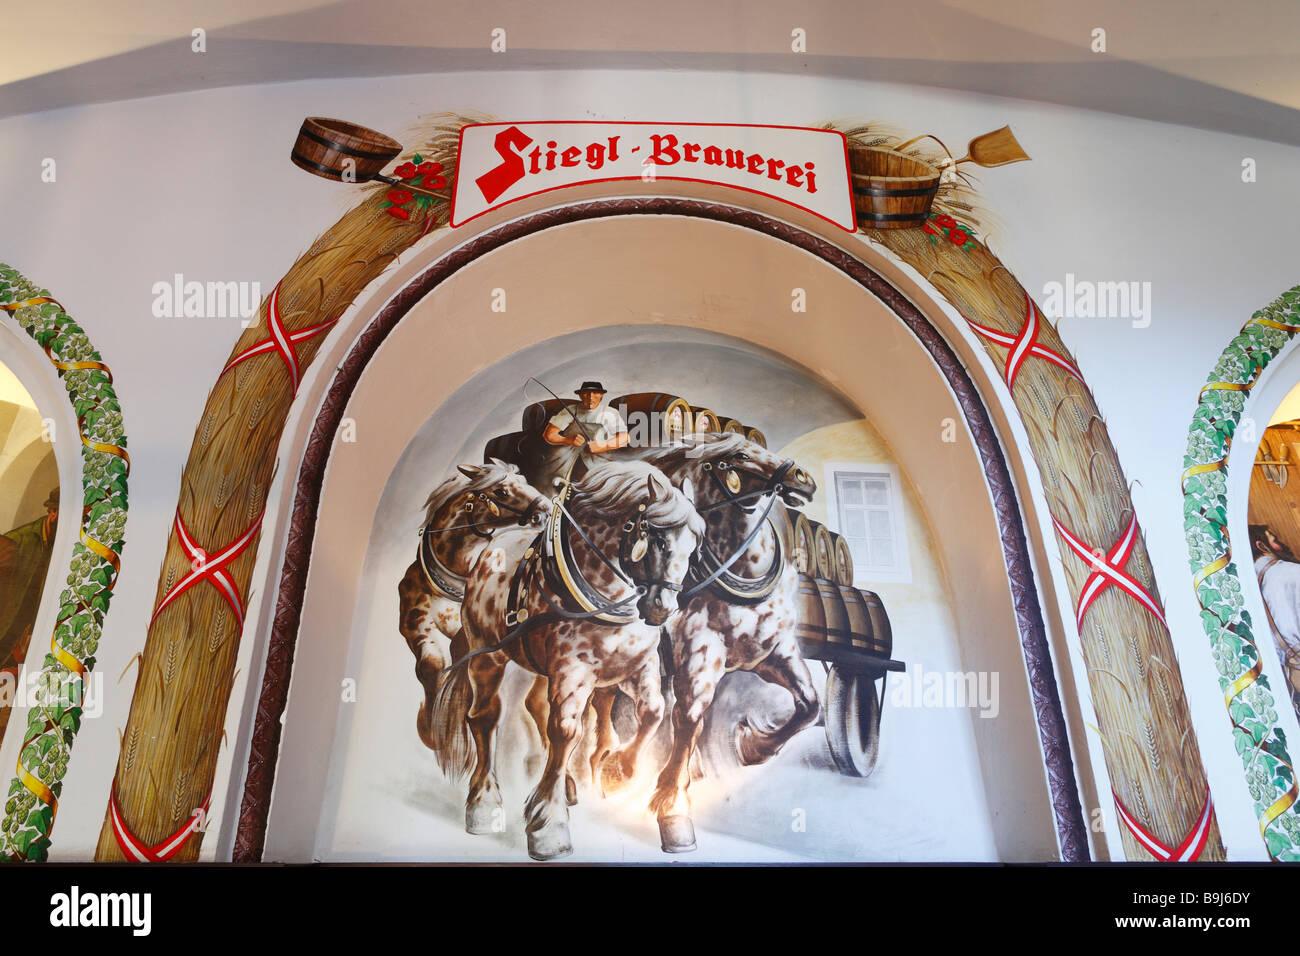 Mural in the Stiegl brewery, Salzburg, Austria, Europe - Stock Image